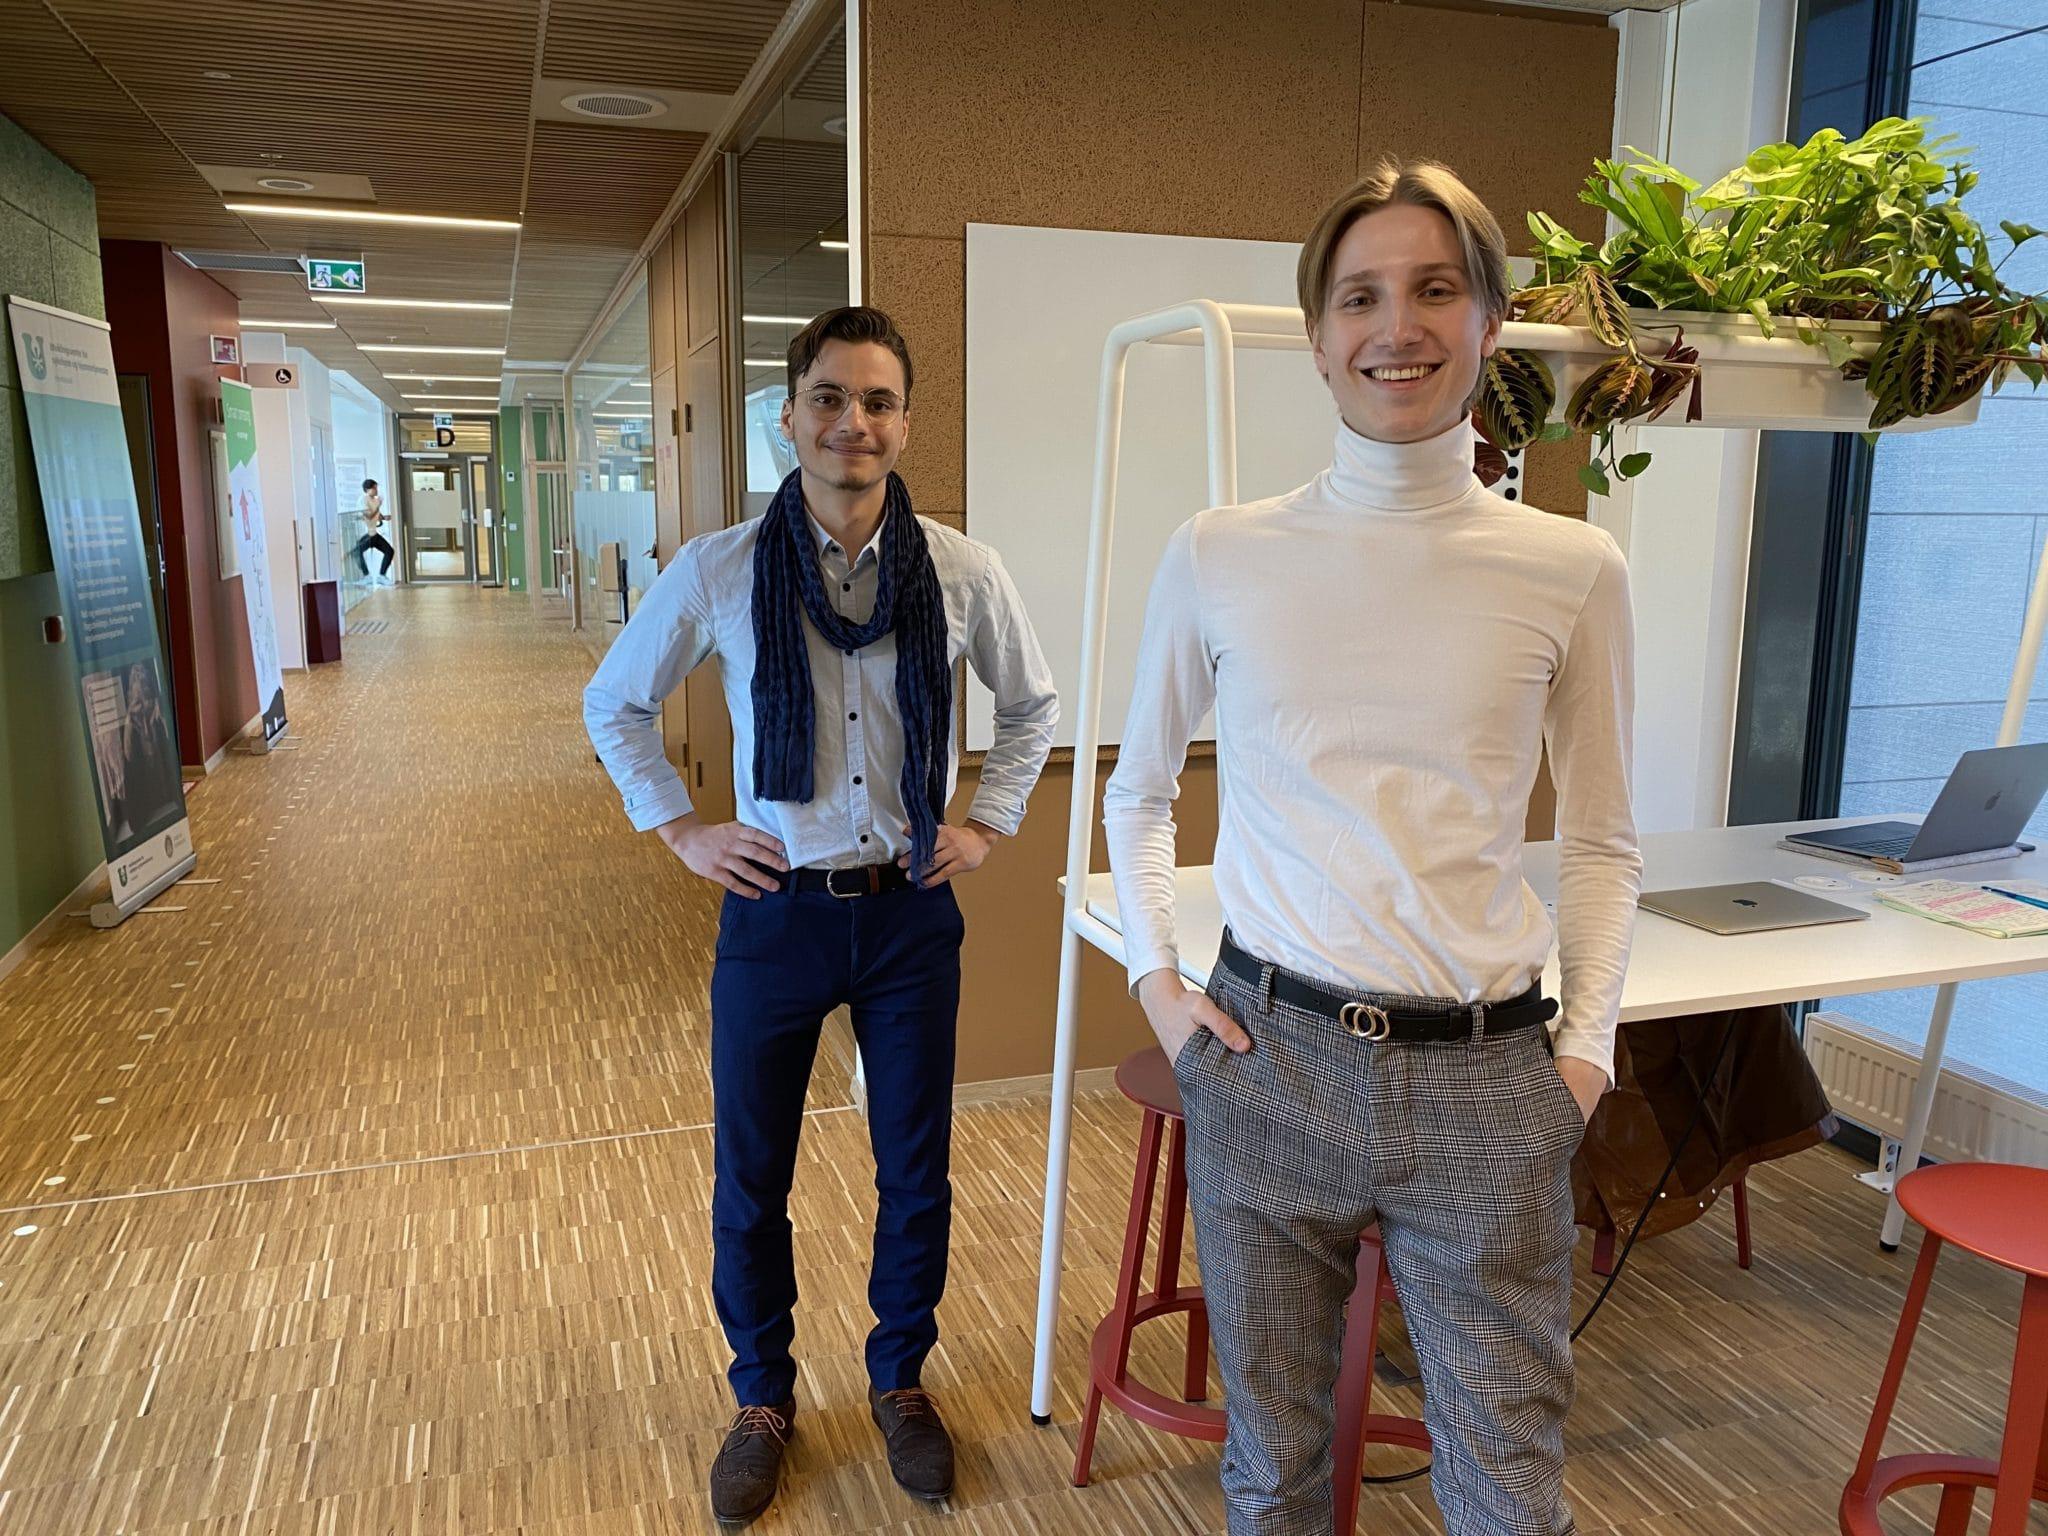 Haakon Rosland og Torbjørn Nygård